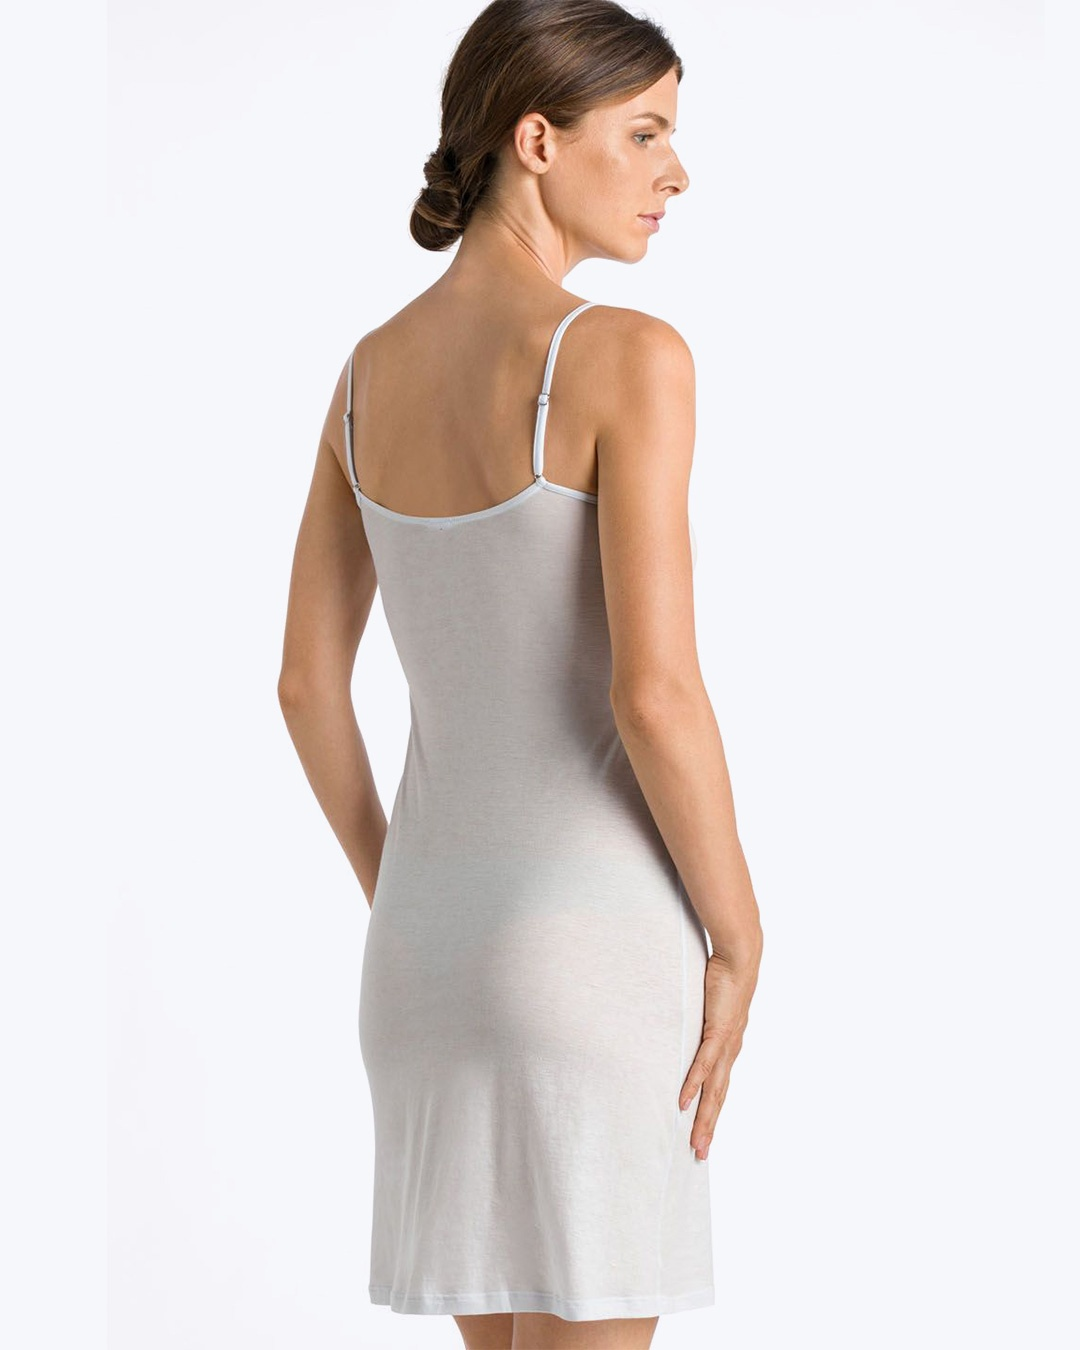 hanro-ultralight-body-dress-celes-blue-1346-back-dianes-lingerie-vancouver-1080x1350